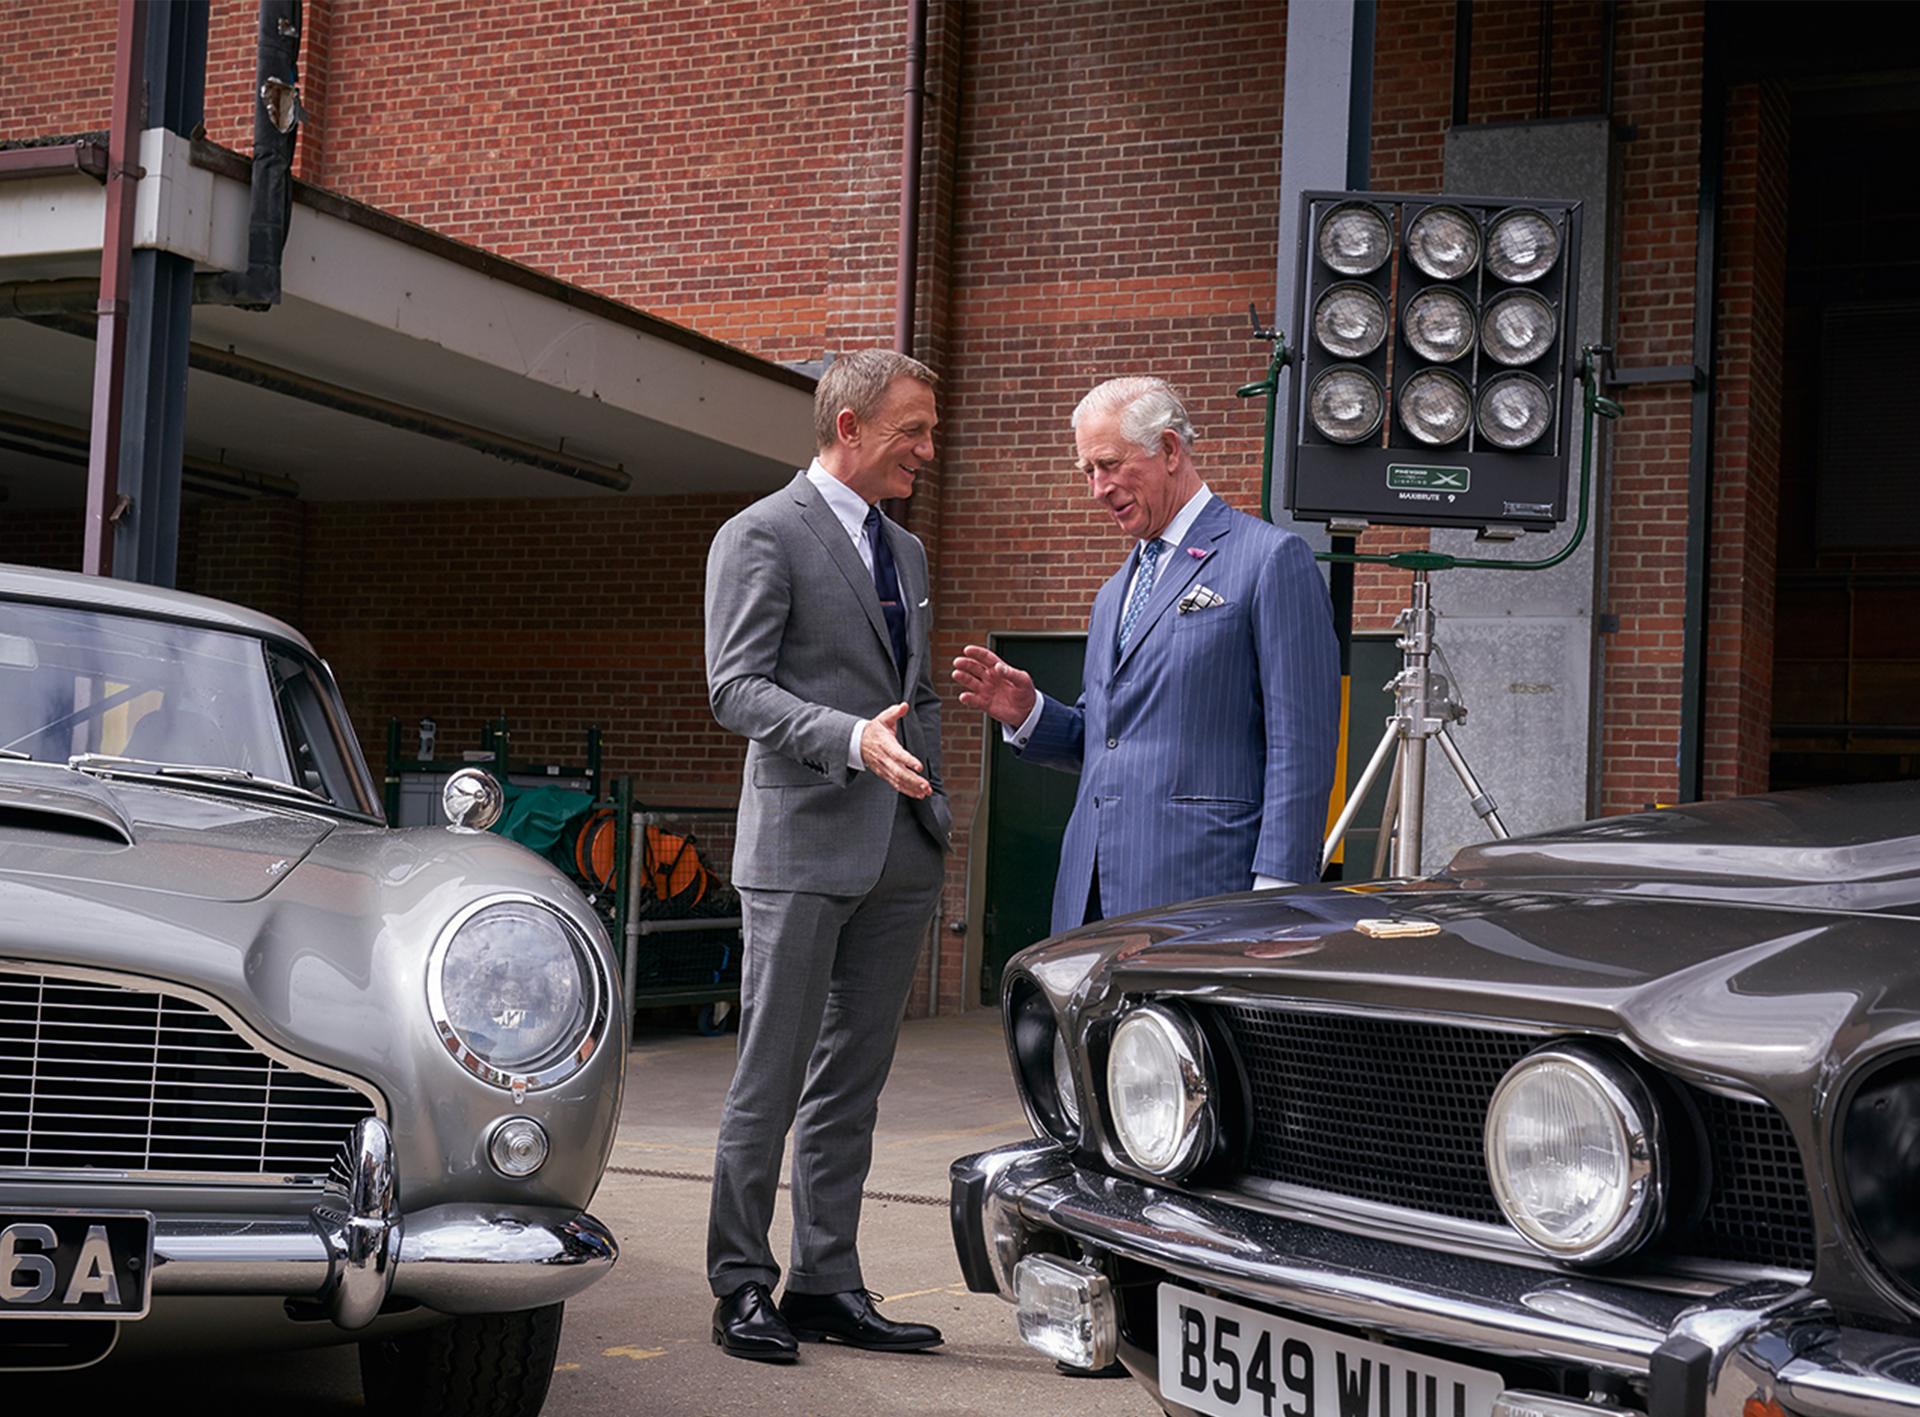 HRH The Prince of Wales Visits Bond 25 Sets